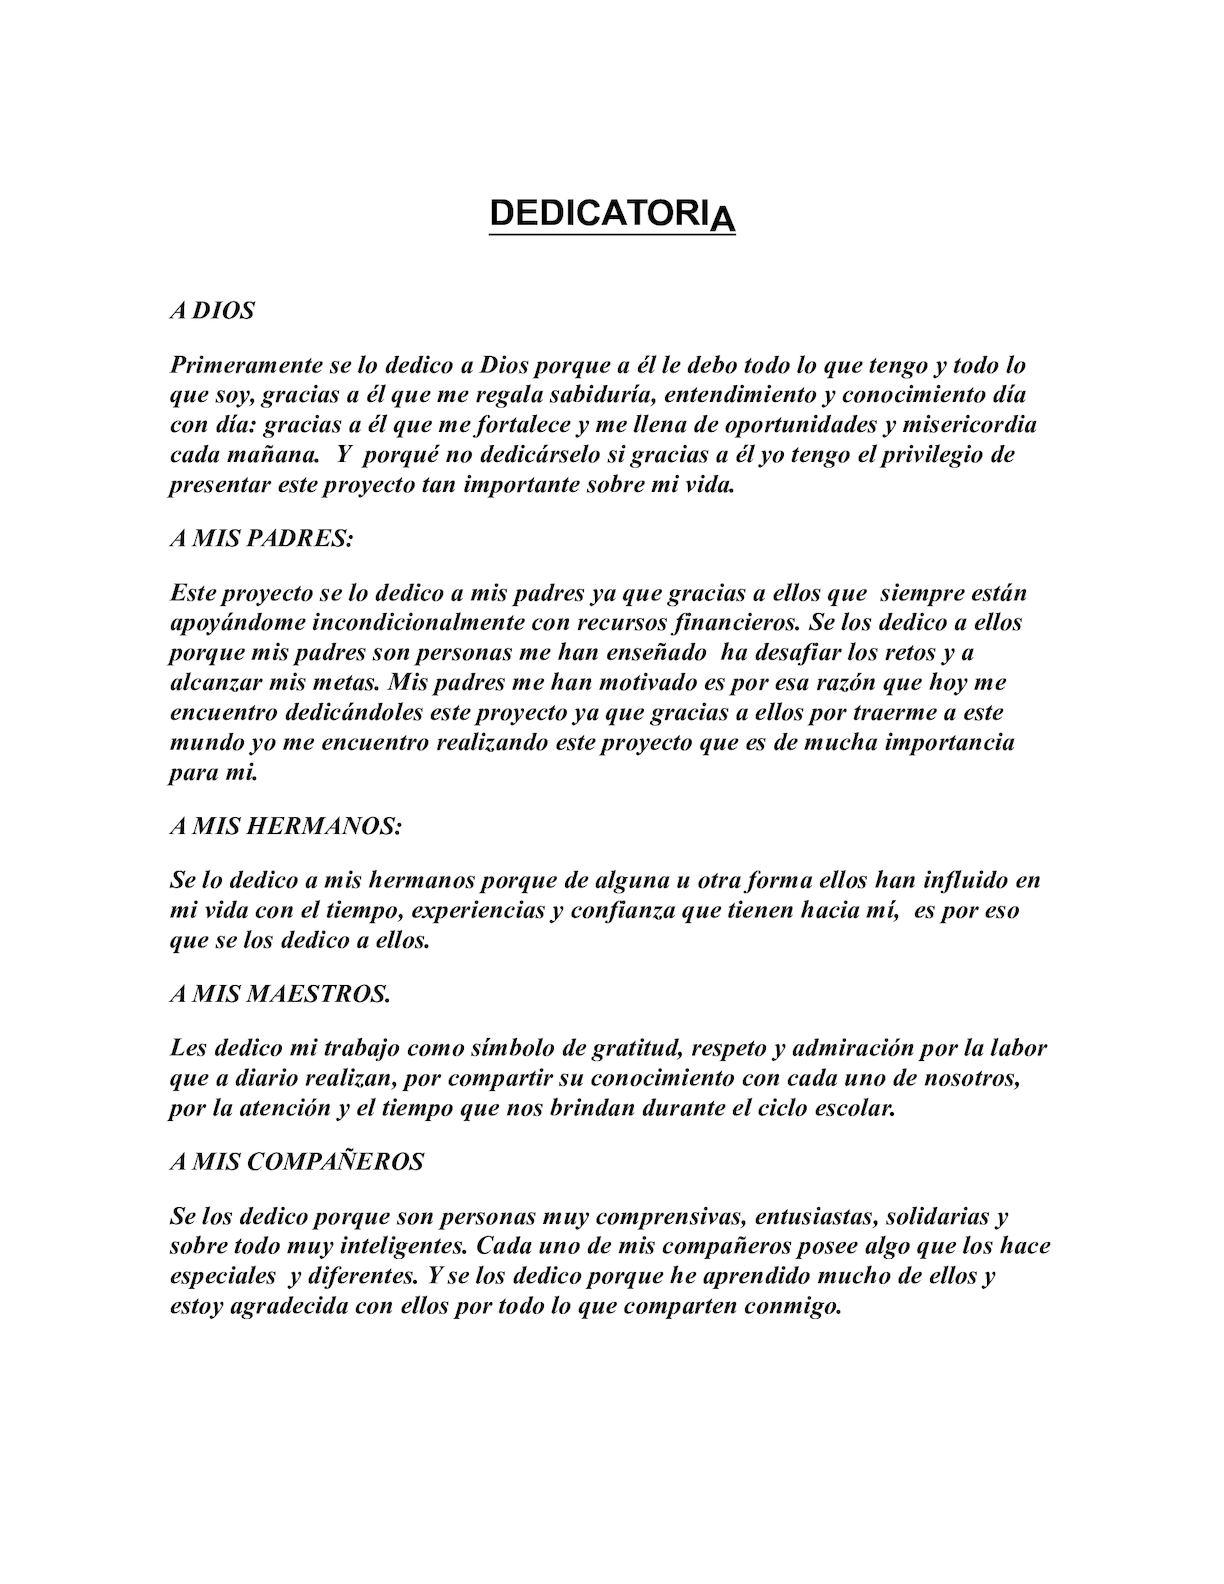 foto de Calaméo - Dedicatoria